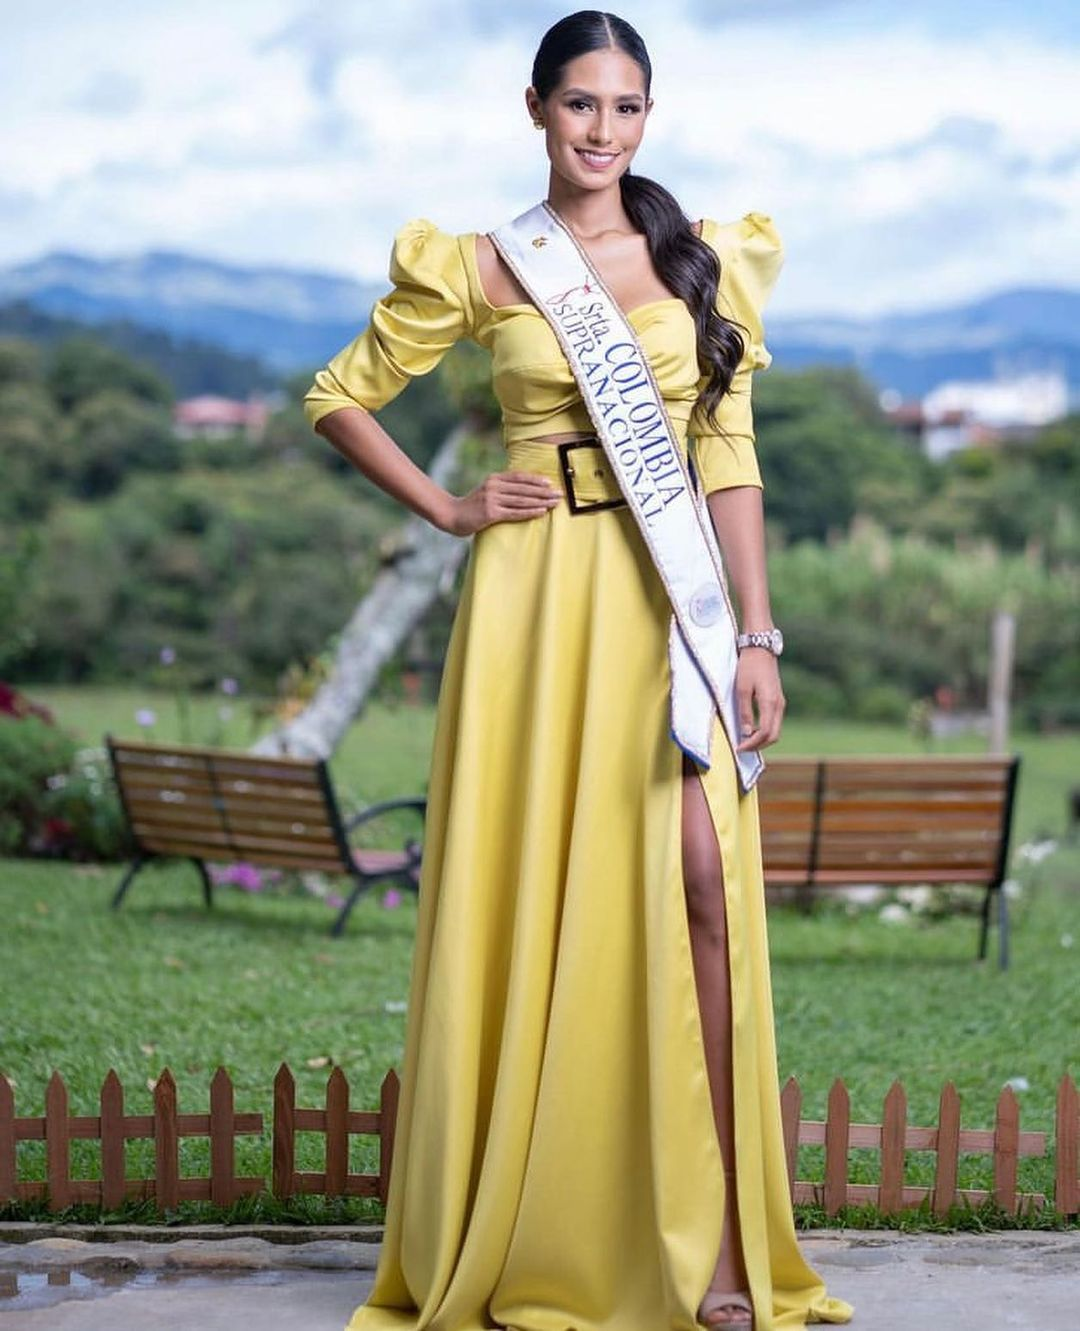 valentina aldana, miss supranational colombia 2021. 22765615